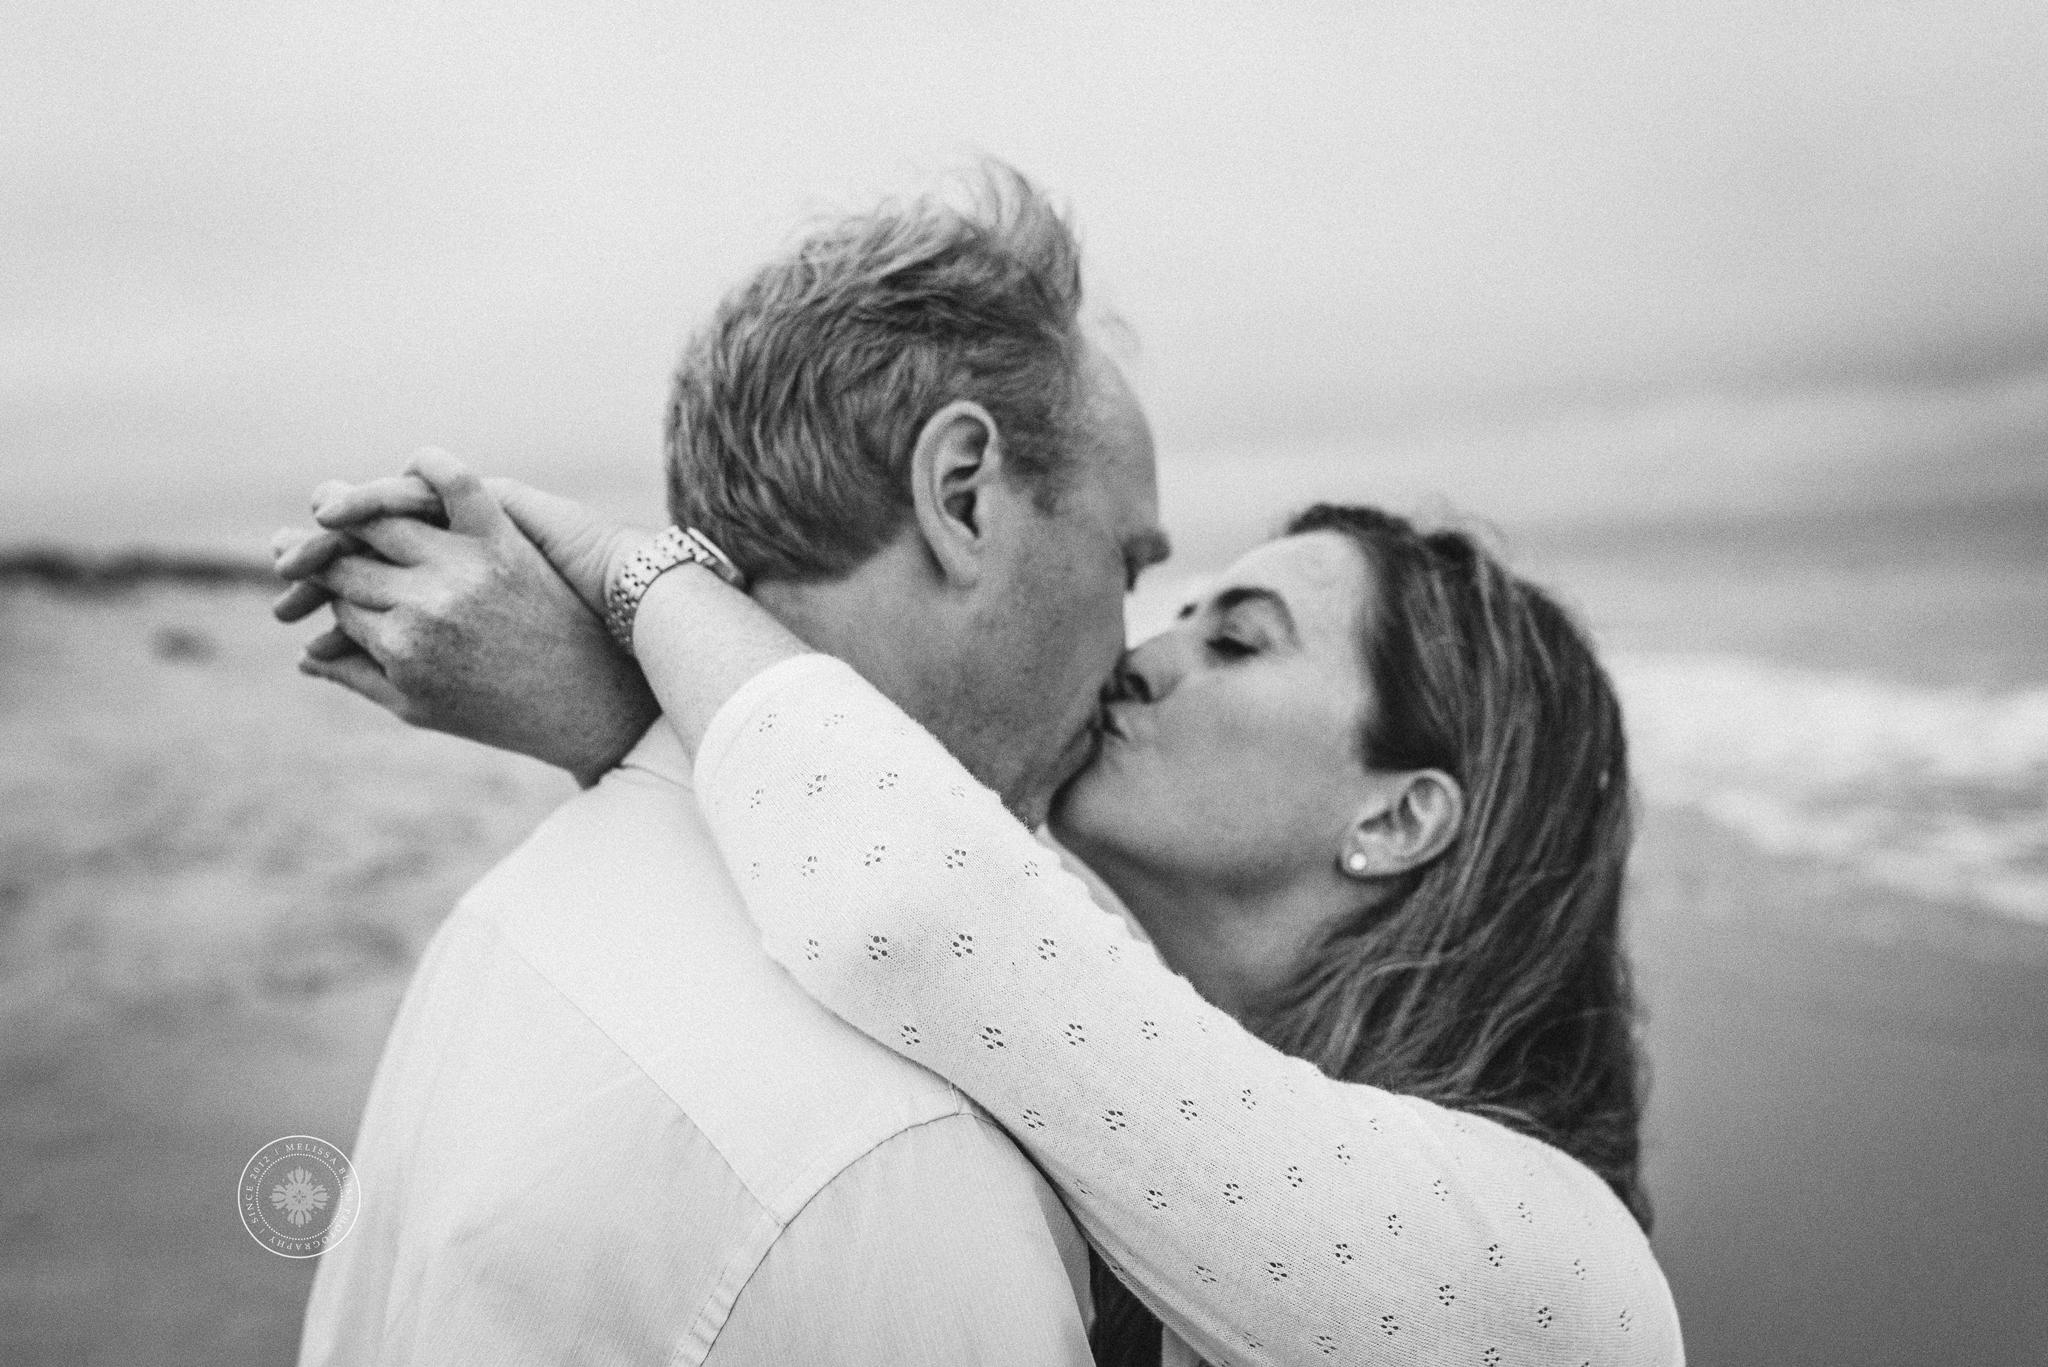 couple-kissing-on-the-beach-romantic-beach-photography-melissa-bliss-photography-virginia-beach-norfolk-chesapeake-engagement-photographers.png